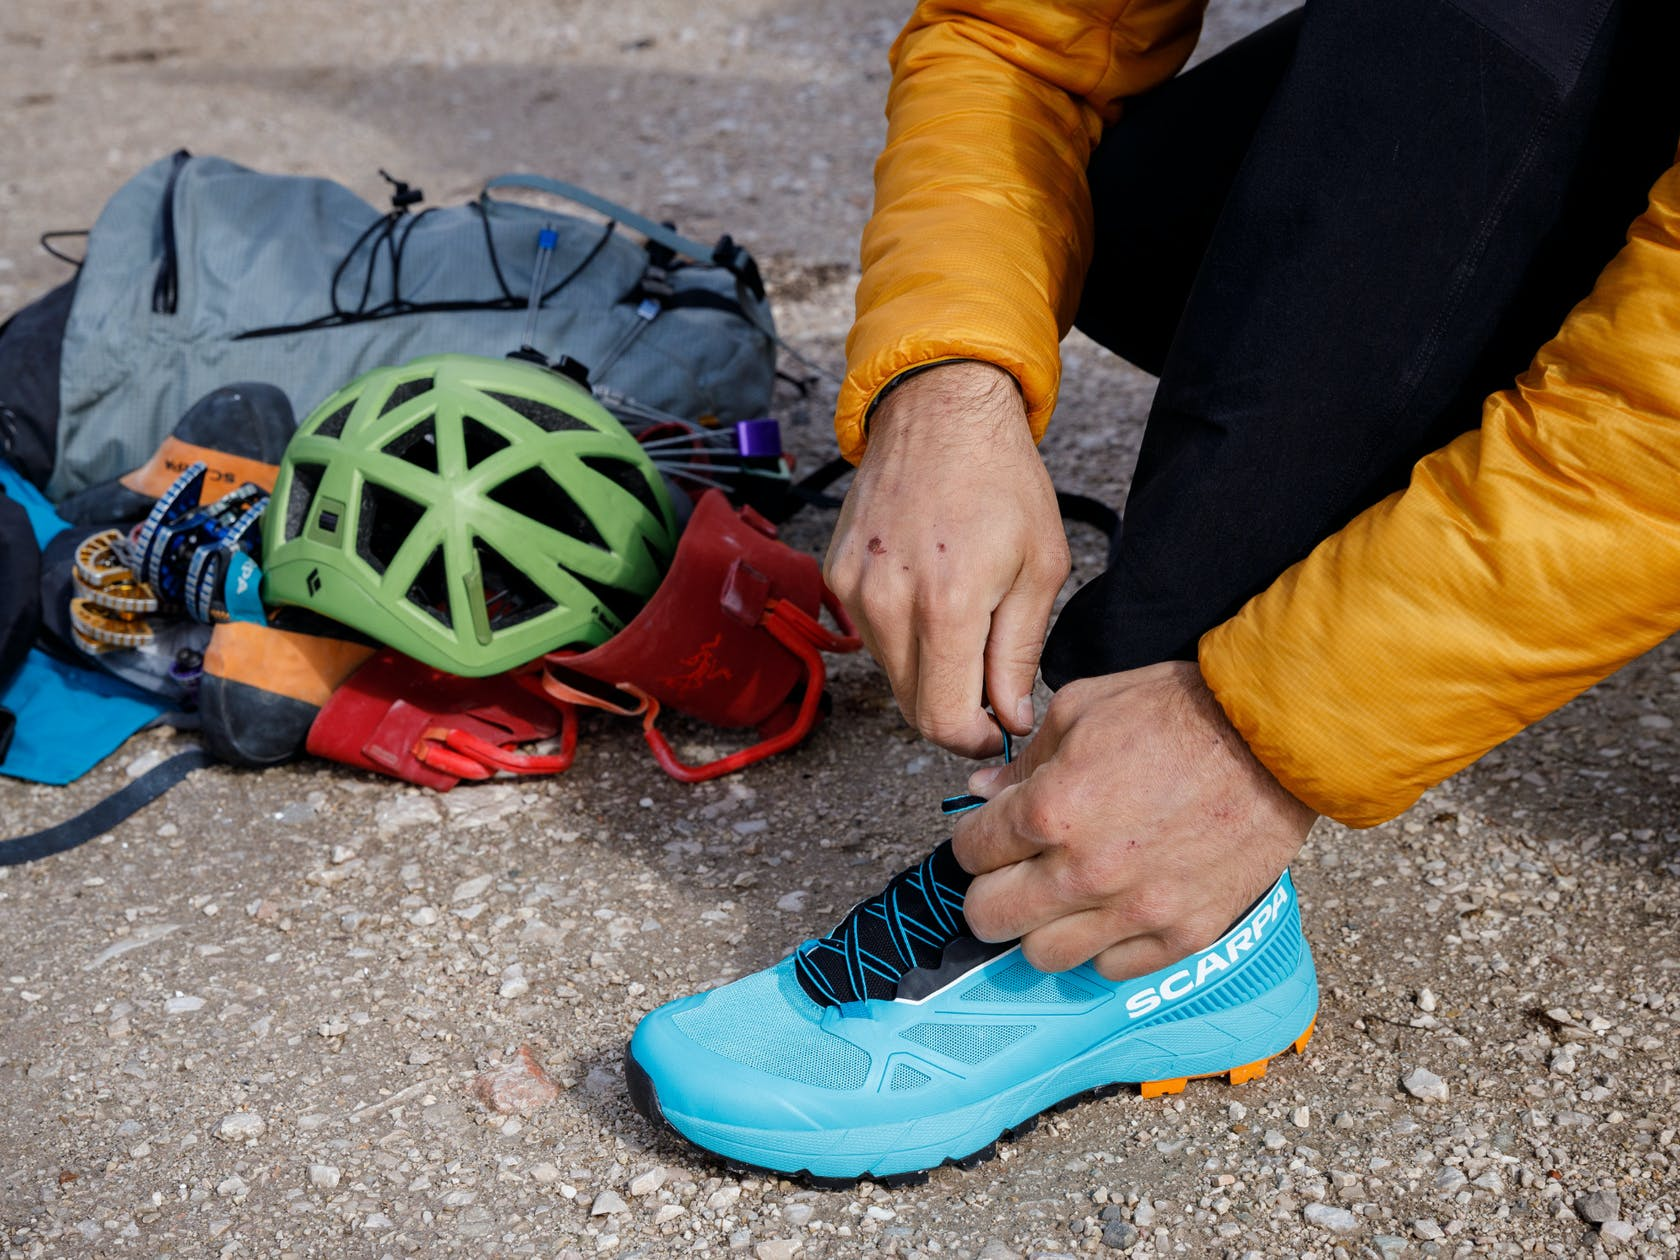 SCARPA scarpe da avvicinamento Shop Online SPORTLER